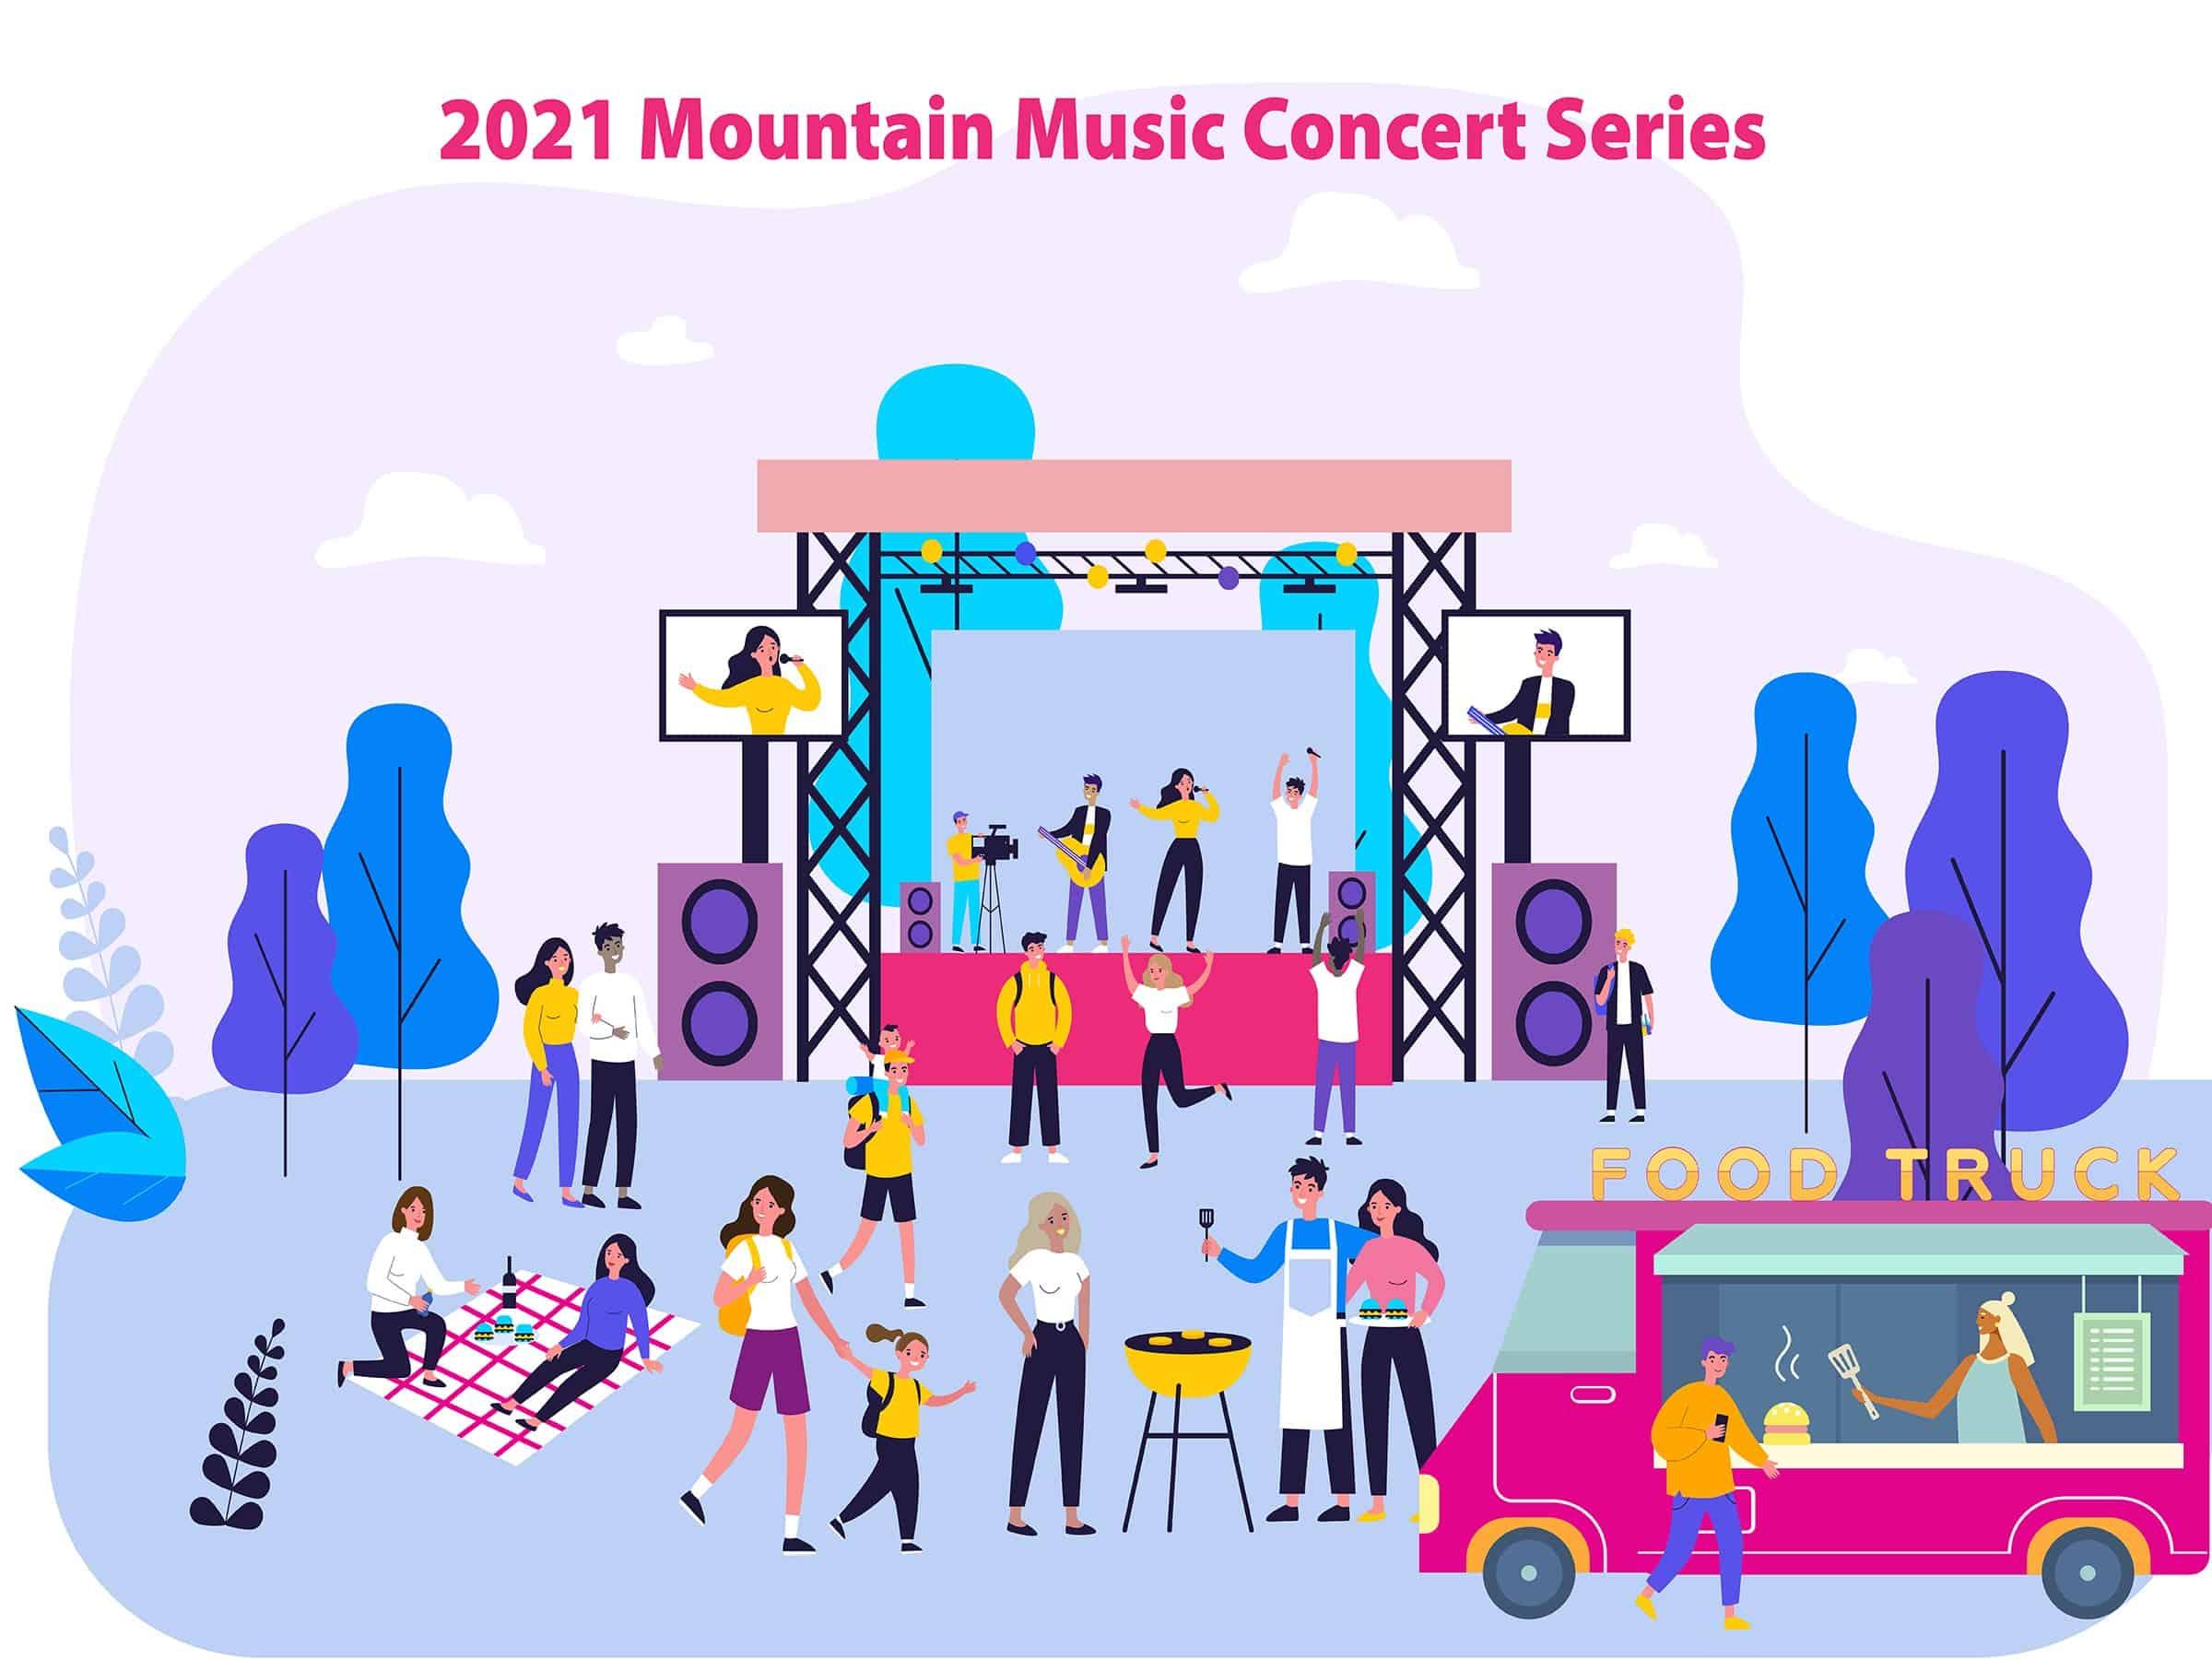 2021 Mountain Music Concert Series